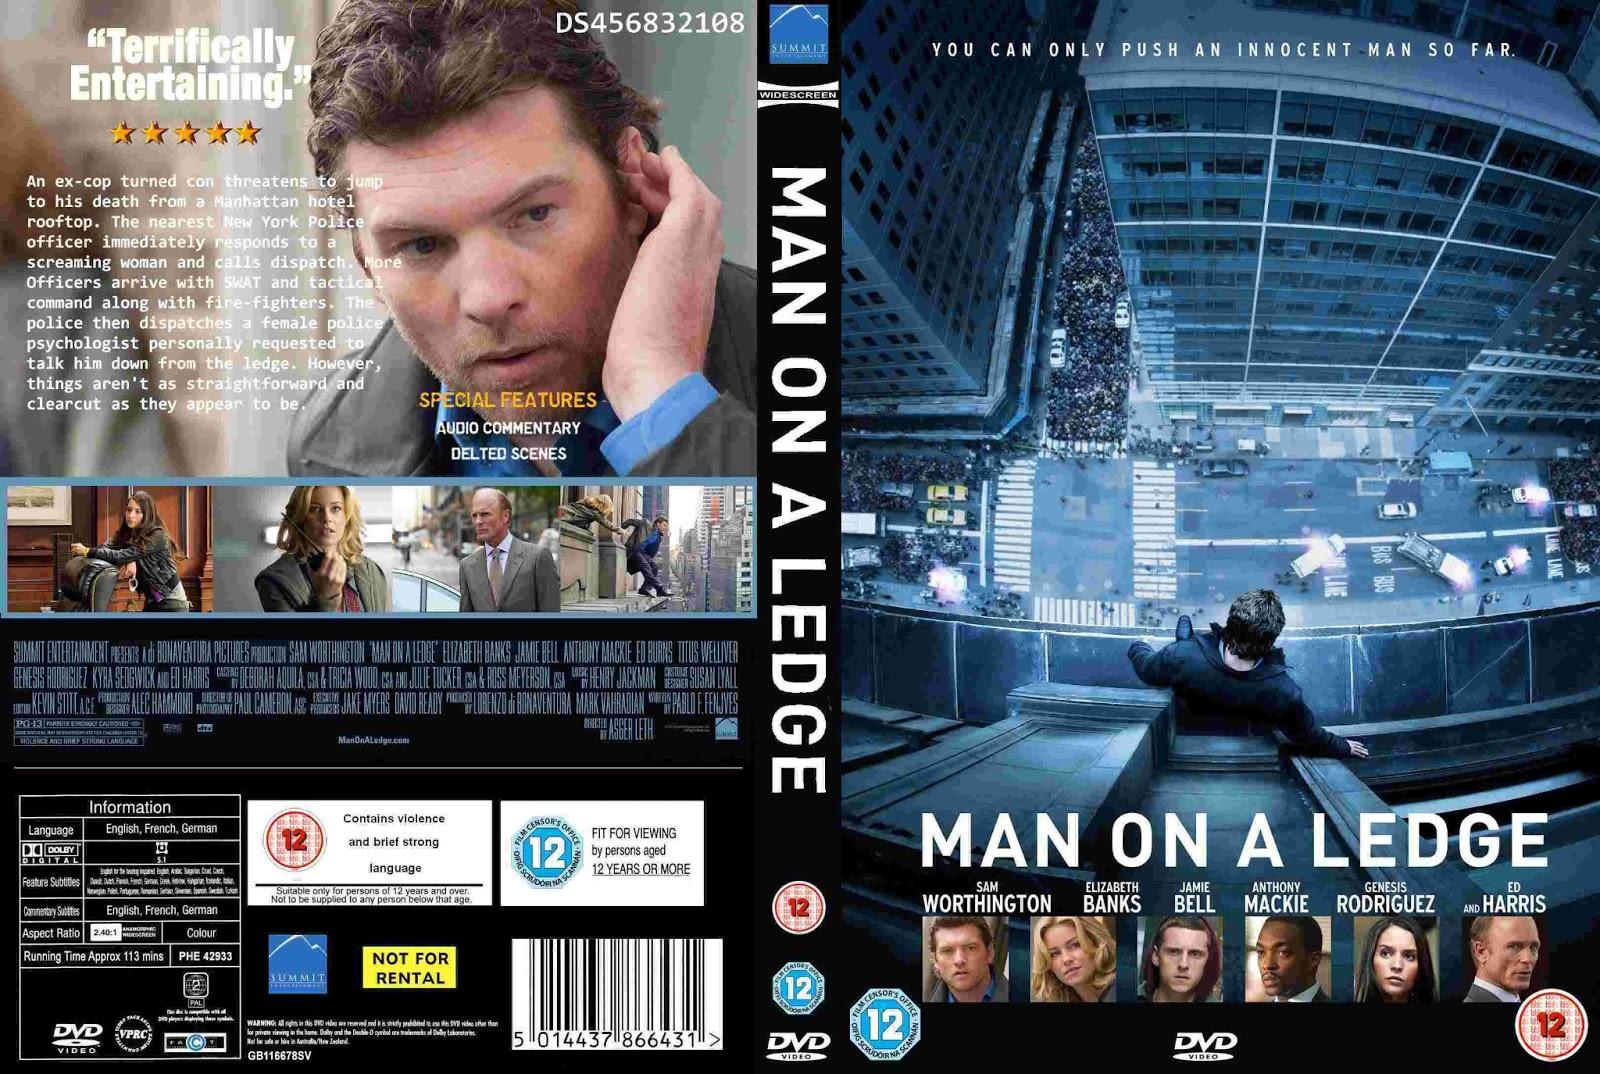 vagebond u0026 39 s movie screenshots  man on a ledge  2012